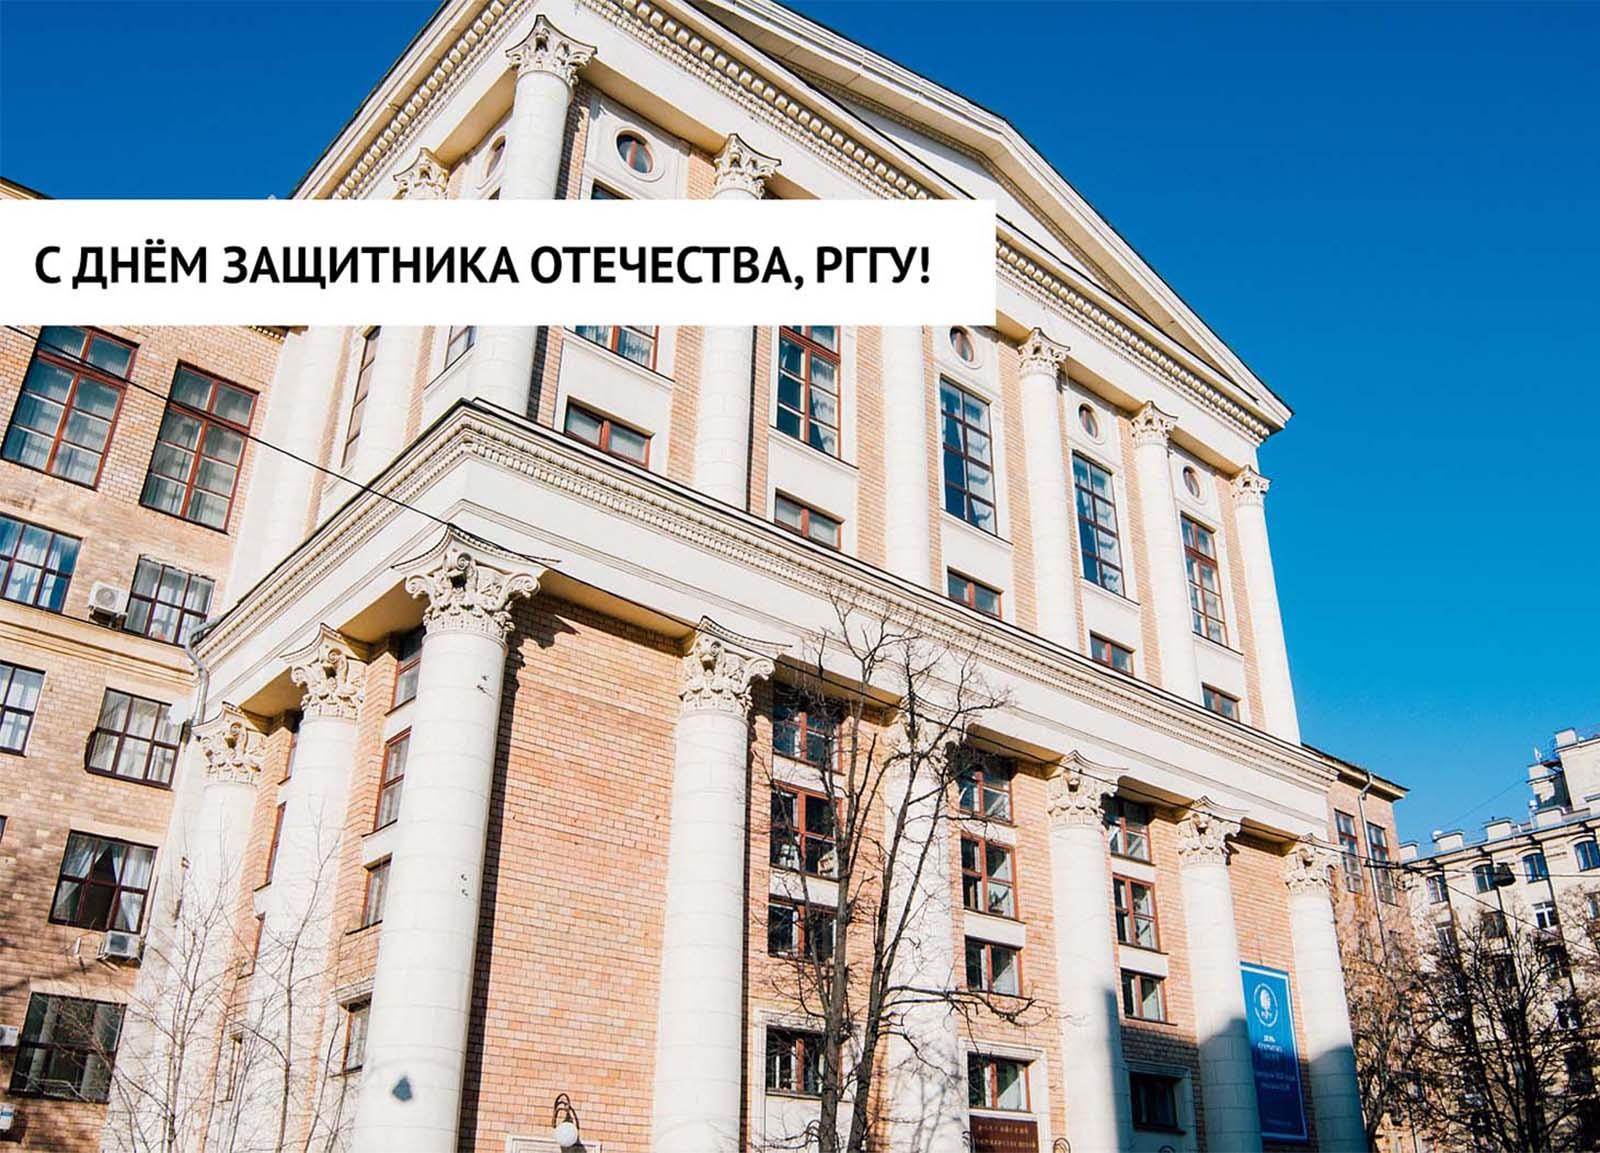 https://www.rsuh.ru/upload/iblock/f70/f70282e03389a142feaa2cbc3ed938e3.jpg